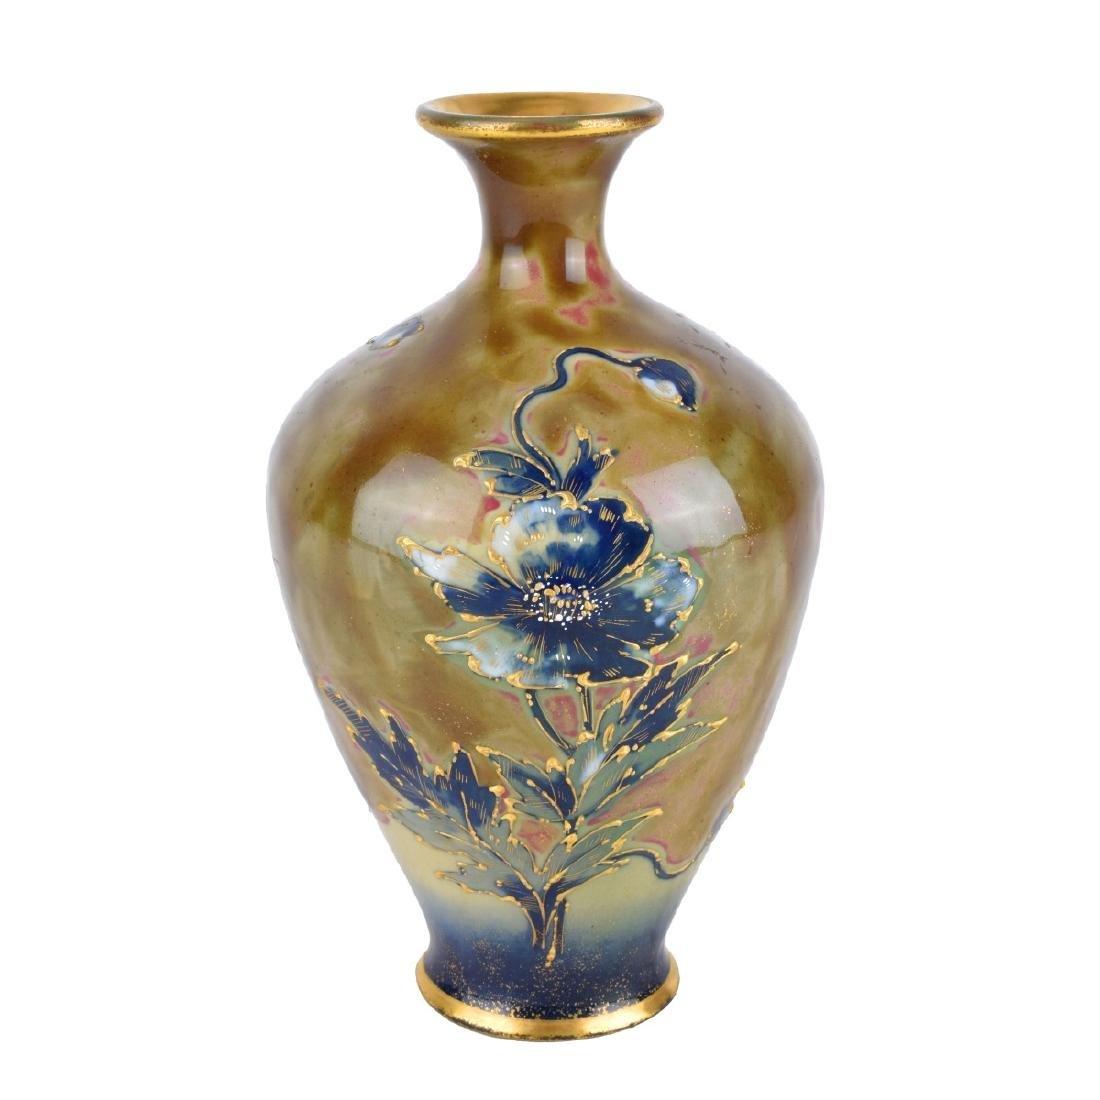 Turn Teplitz Amphora Porcelain Maiden Vase - 2